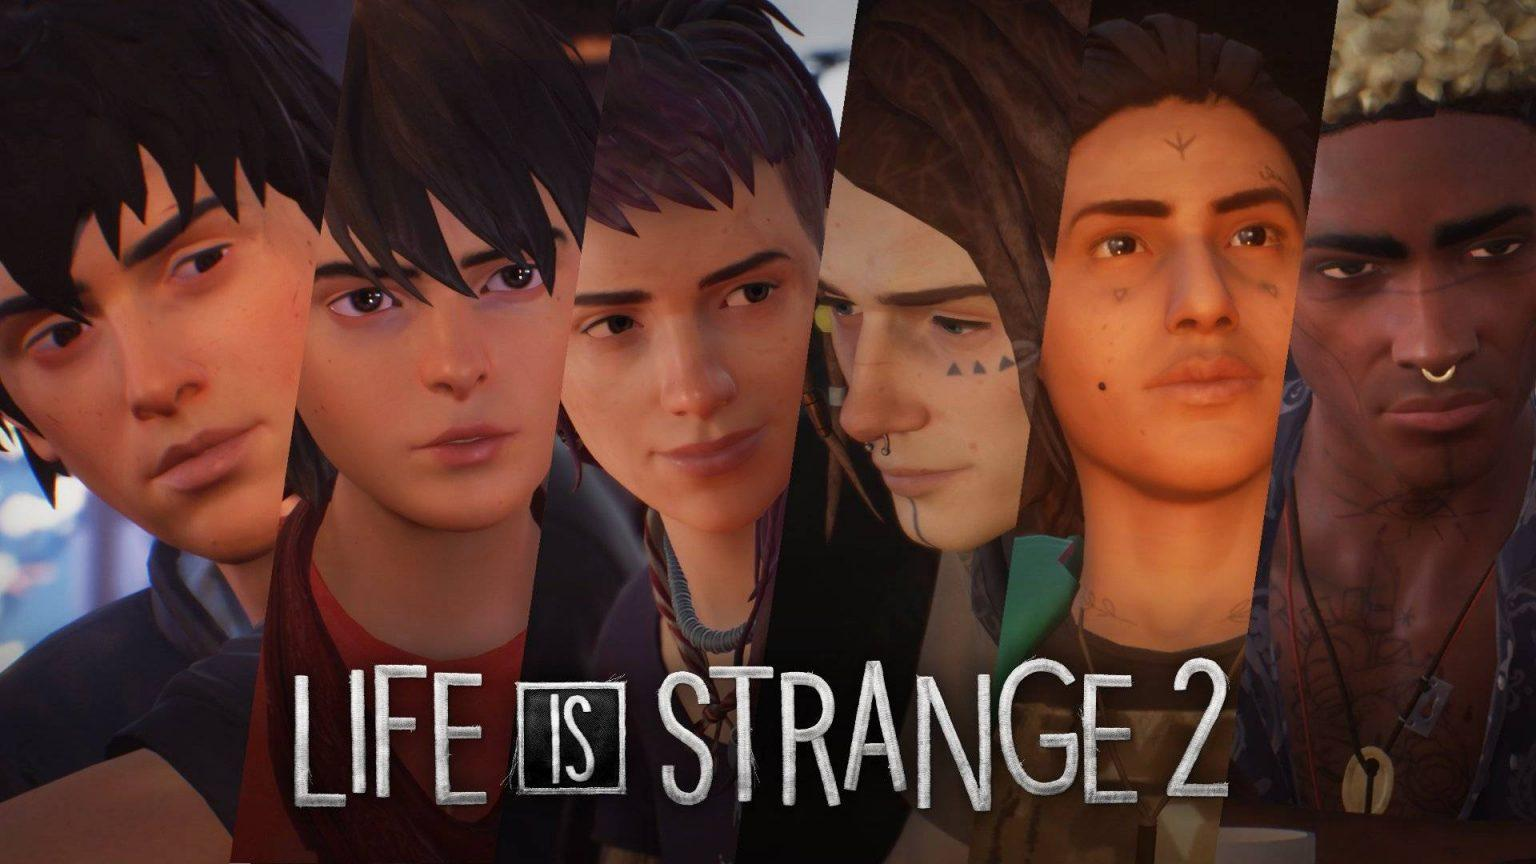 LIFE IS STRANGE 2 PC Latest Version Game Free Download